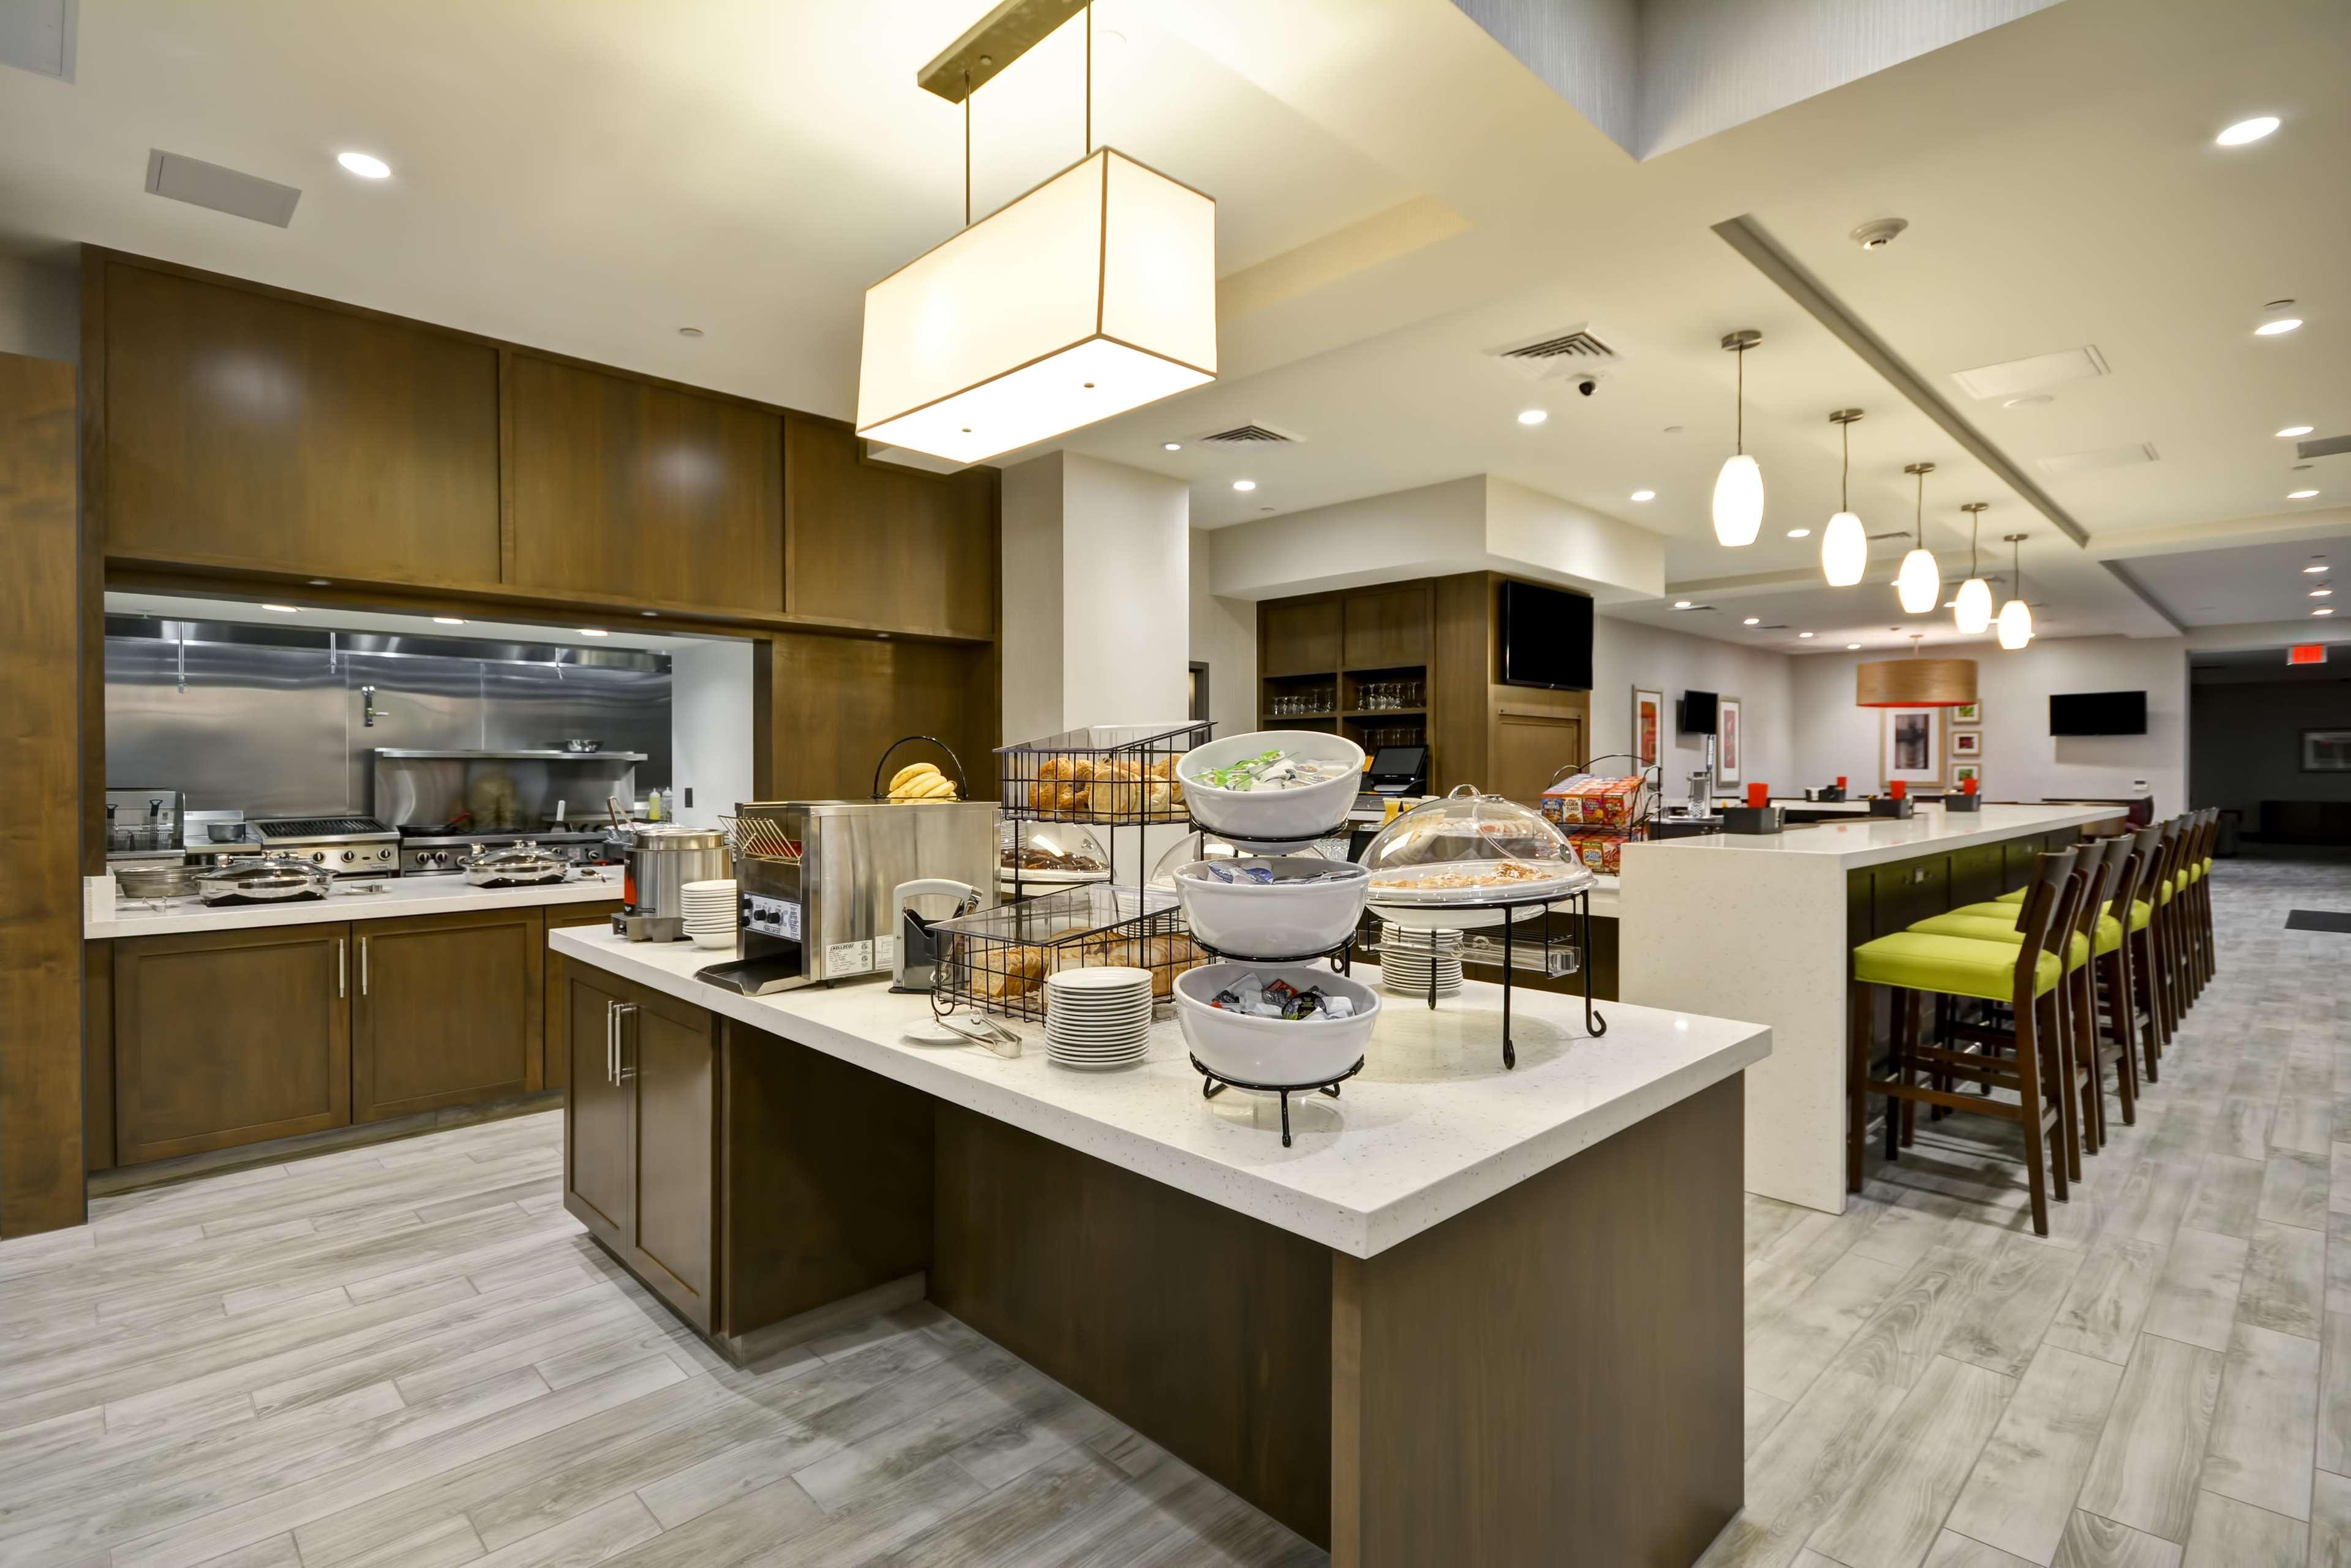 Hilton Garden Inn Phoenix/Tempe ASU Area image 3